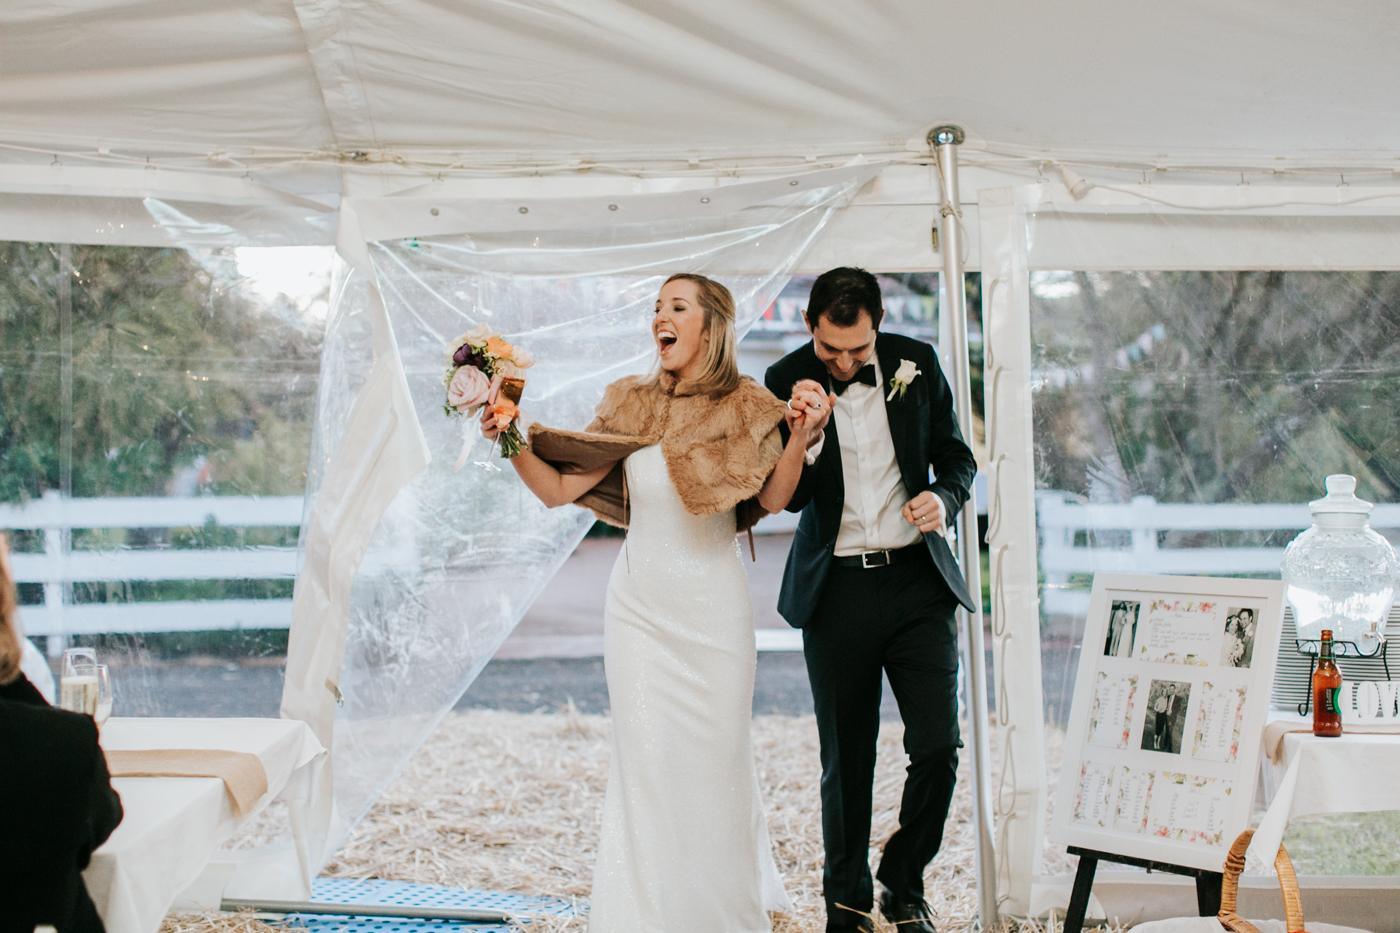 Bridget & James - Orange Country Wedding - Samantha Heather Photography-201.jpg